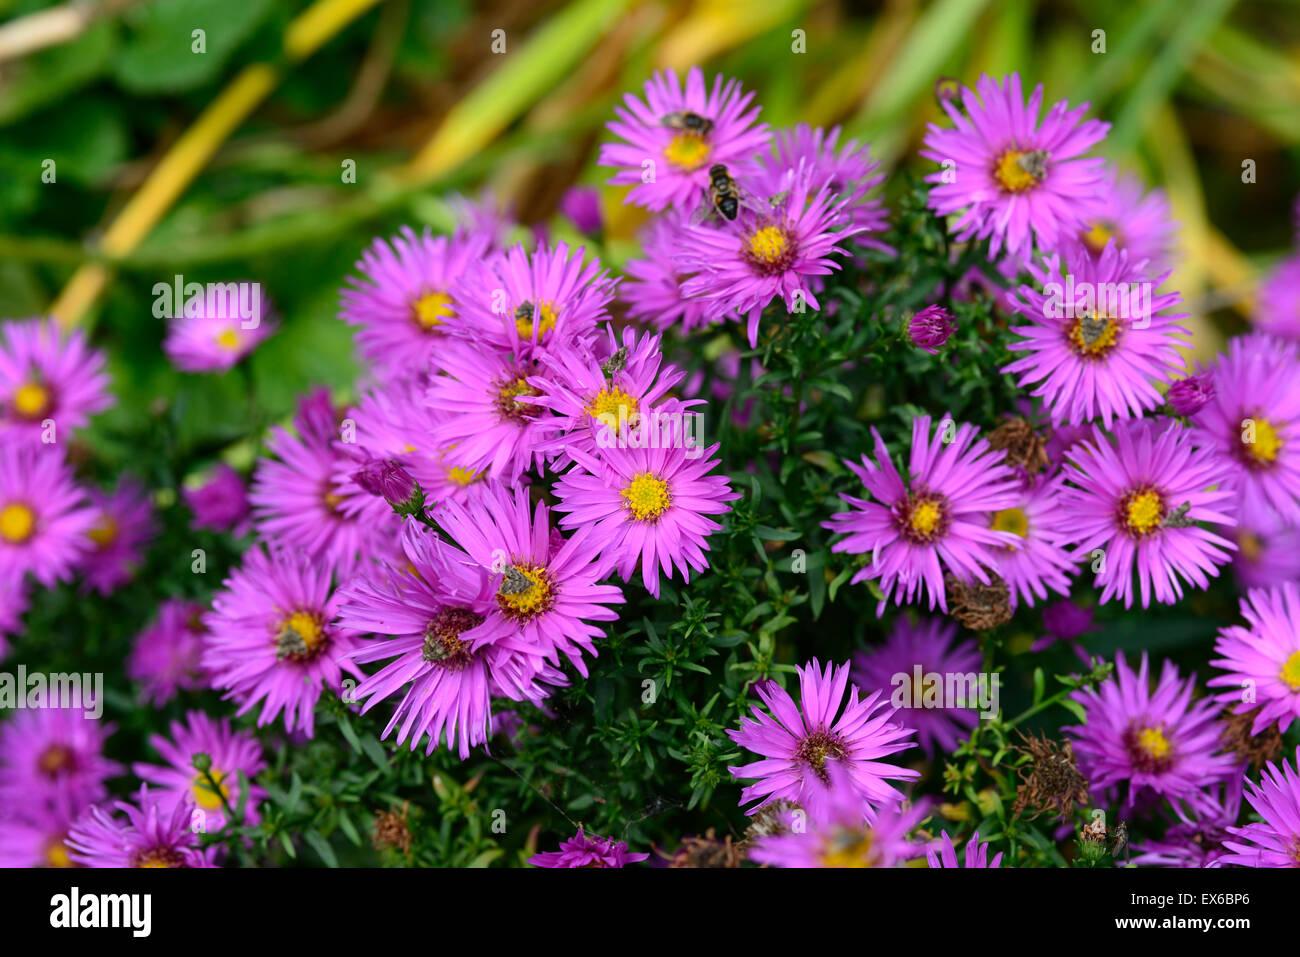 Aster Novi Belgii Dandy Michaelmas Daisy Autumn Flowering Pink